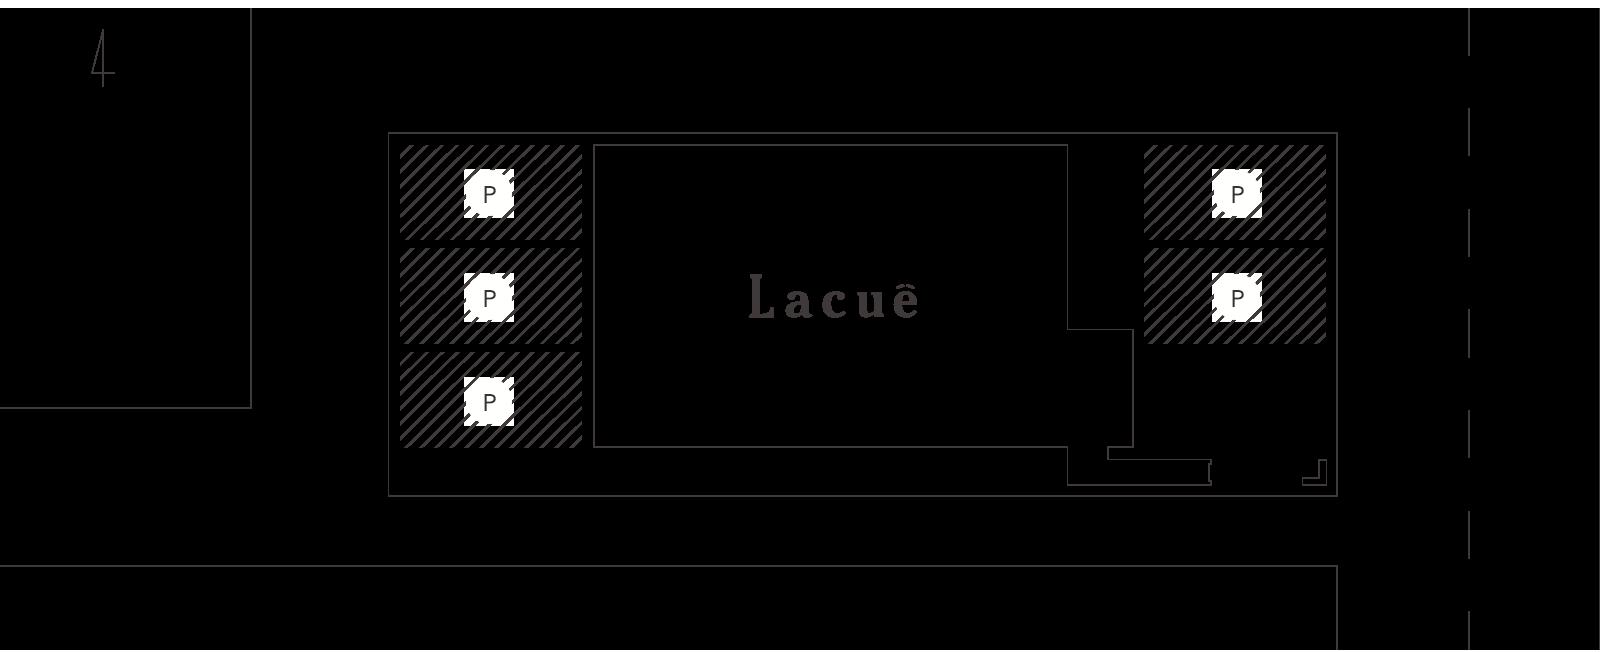 Lacueの駐車場について